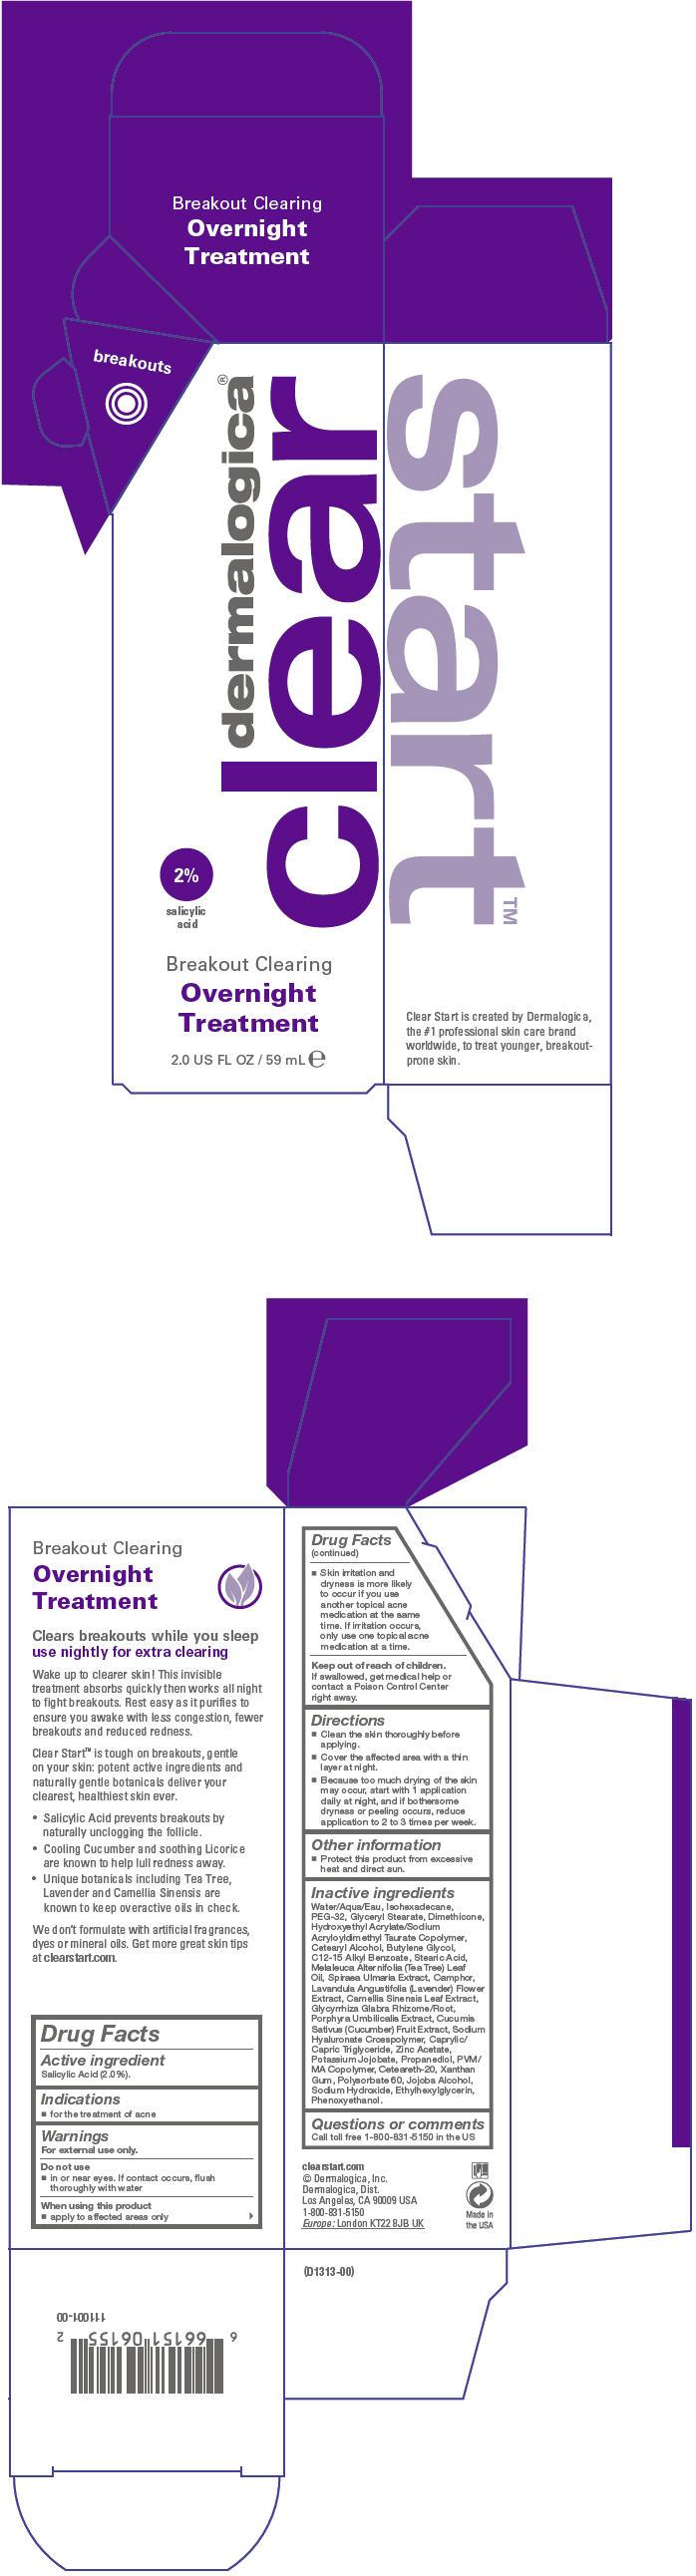 Breakout Clearing Overnight Treatment (Salicylic Acid) Lotion [Dermalogica, Inc.]